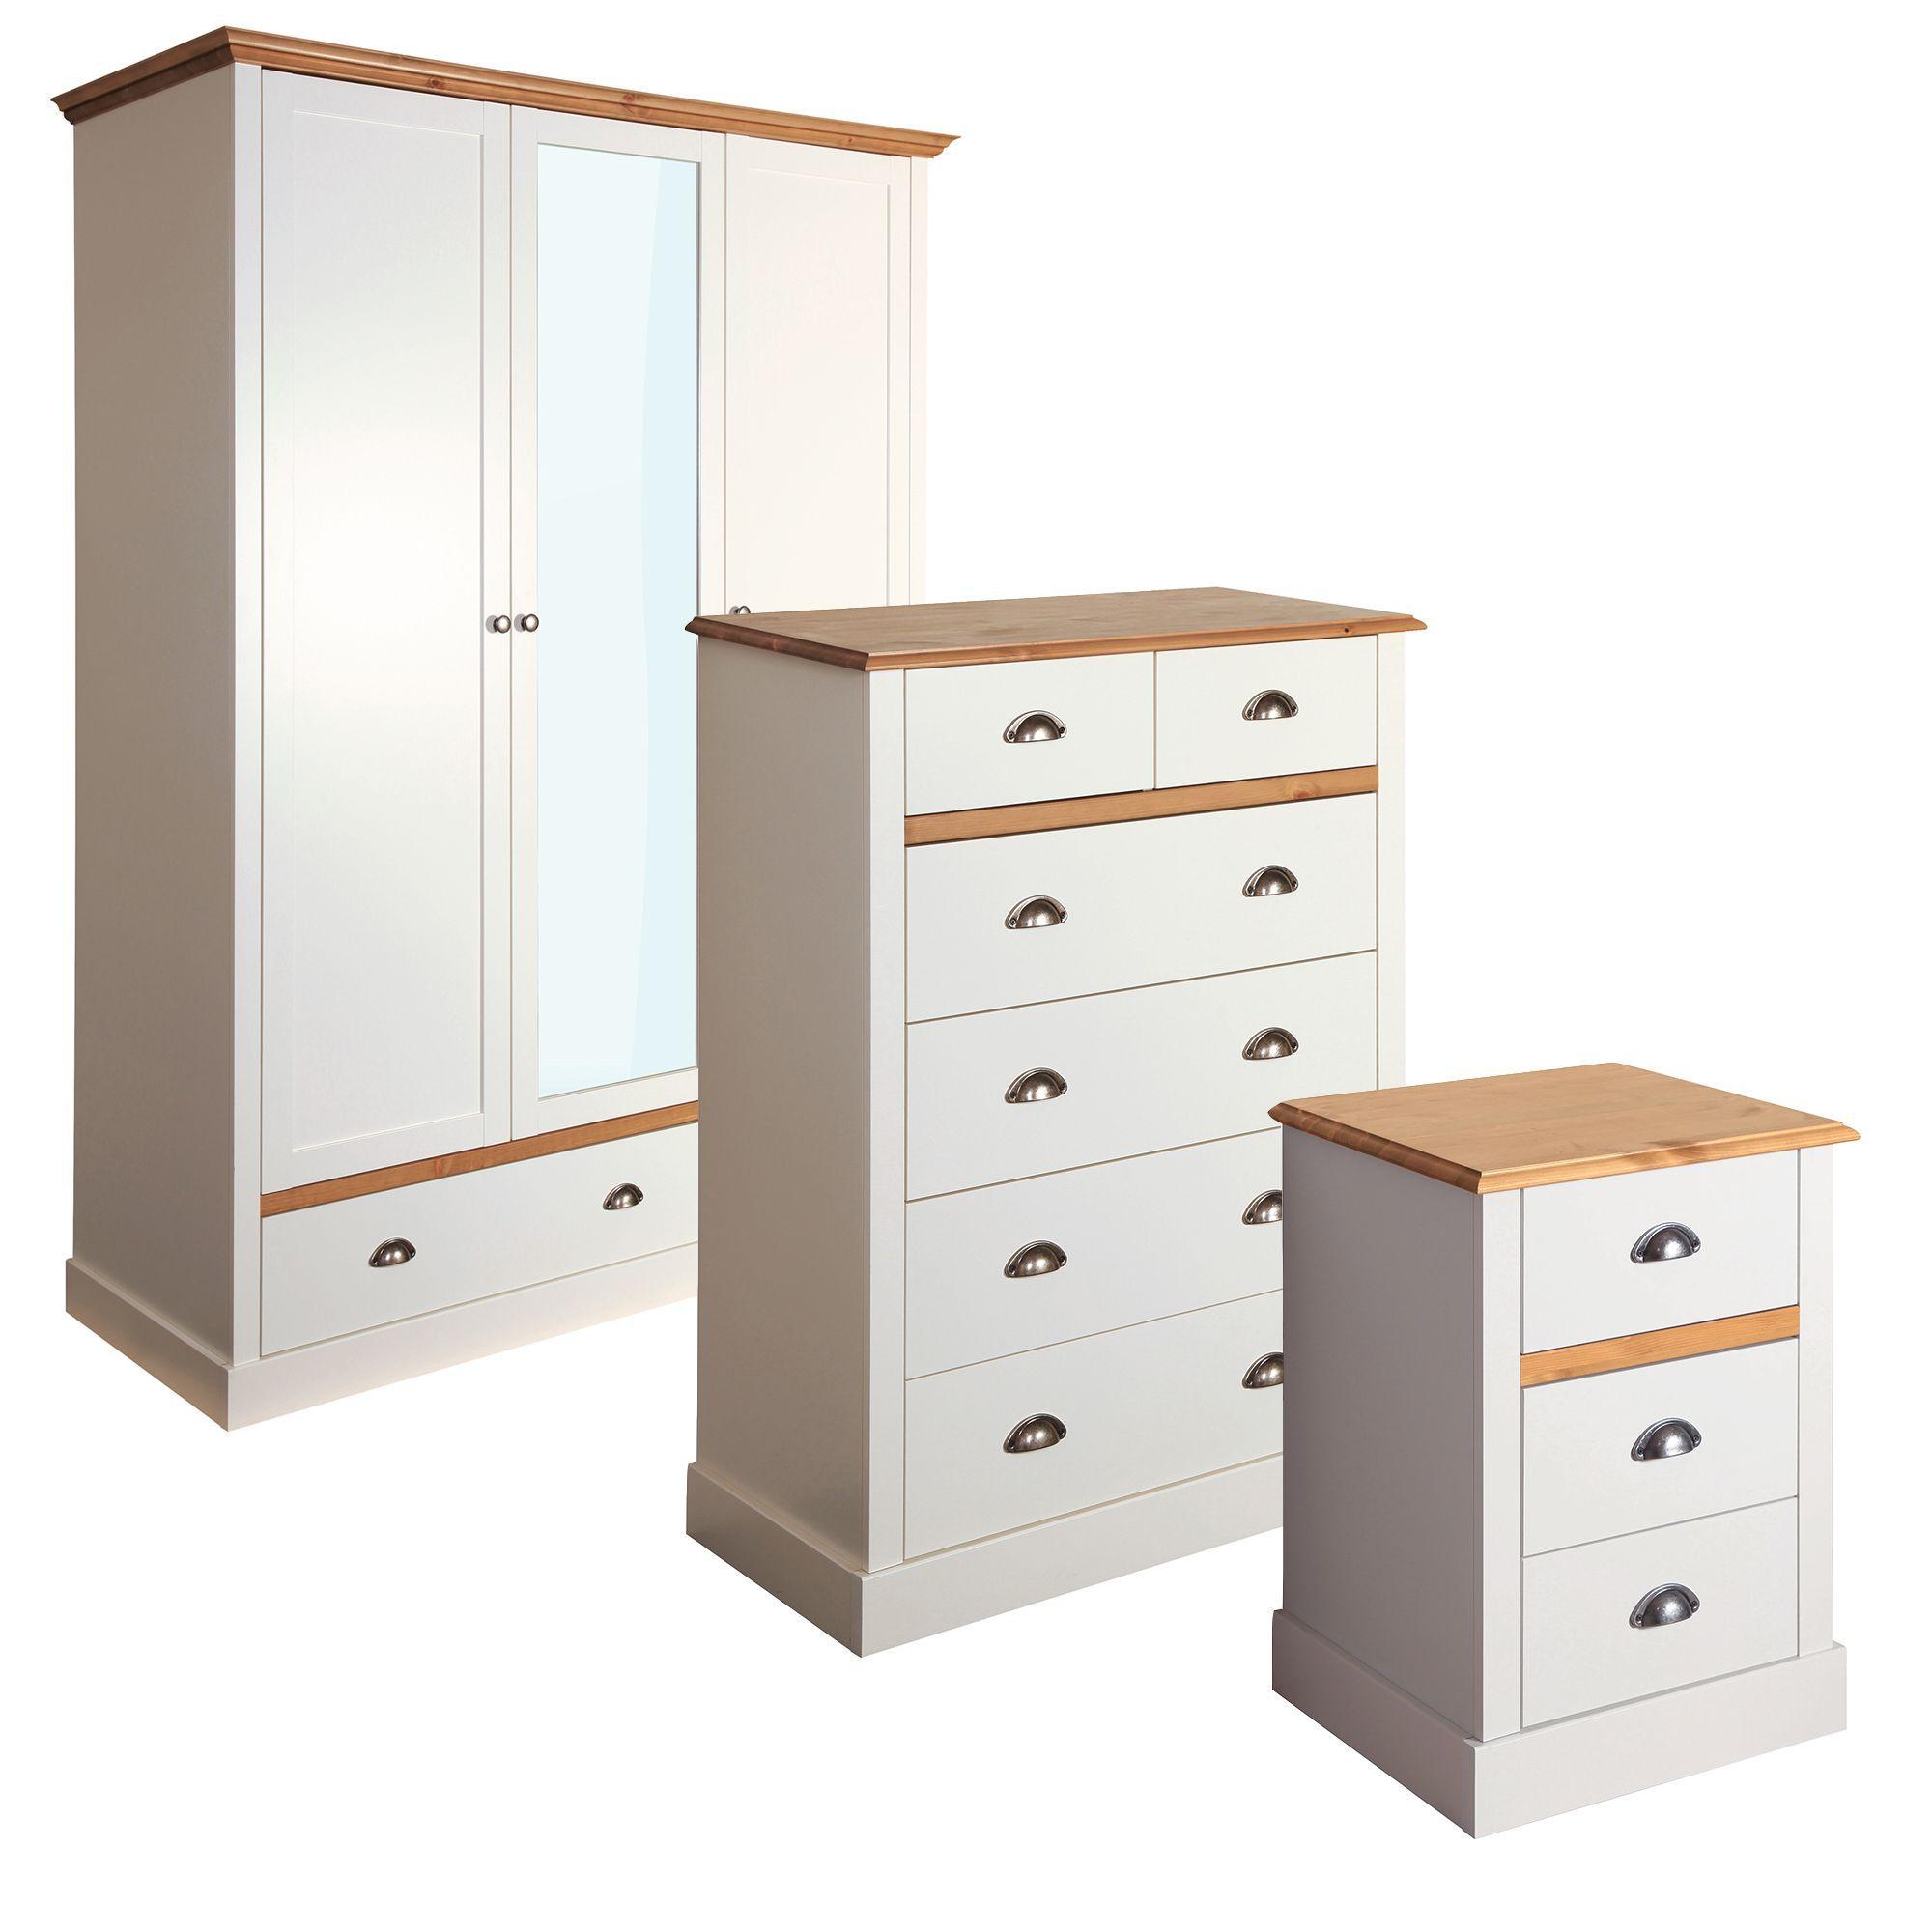 Hemsworth Cream Triple Wardrobe 3 Piece Bedroom Set